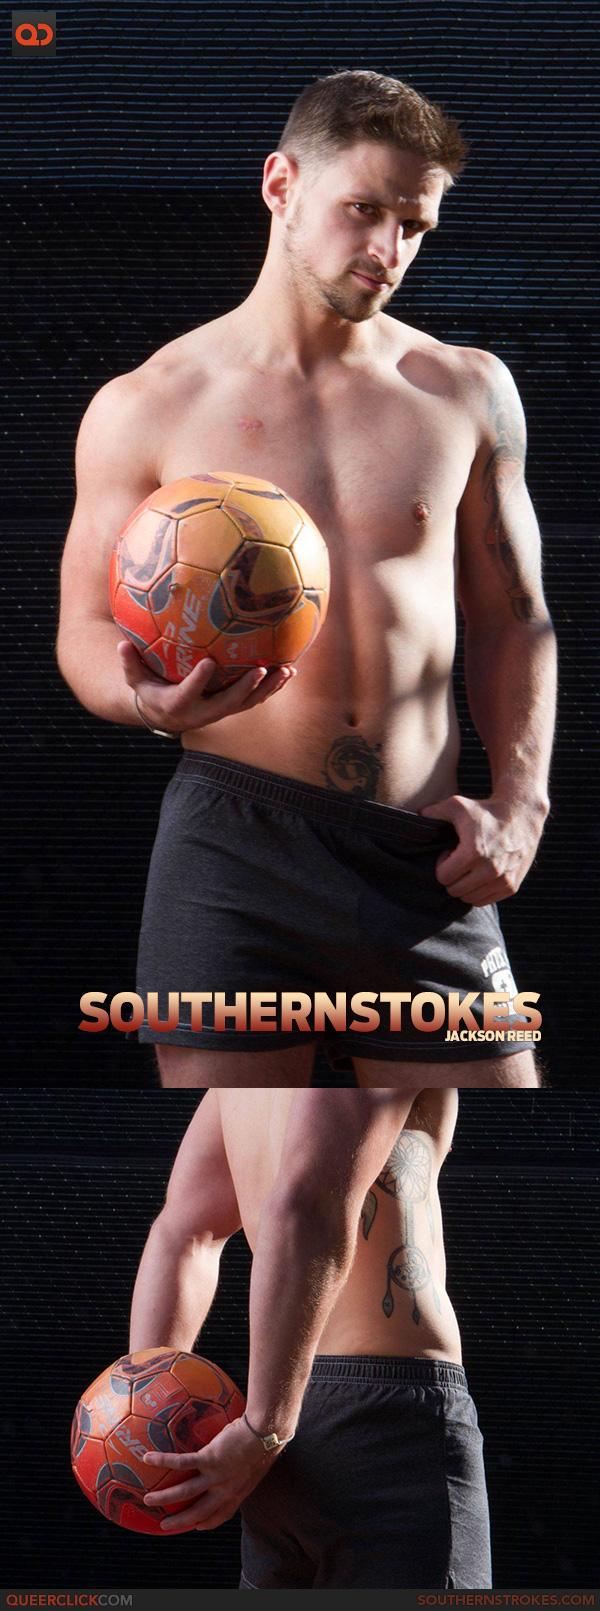 Southern Strokes: Jackson Reed